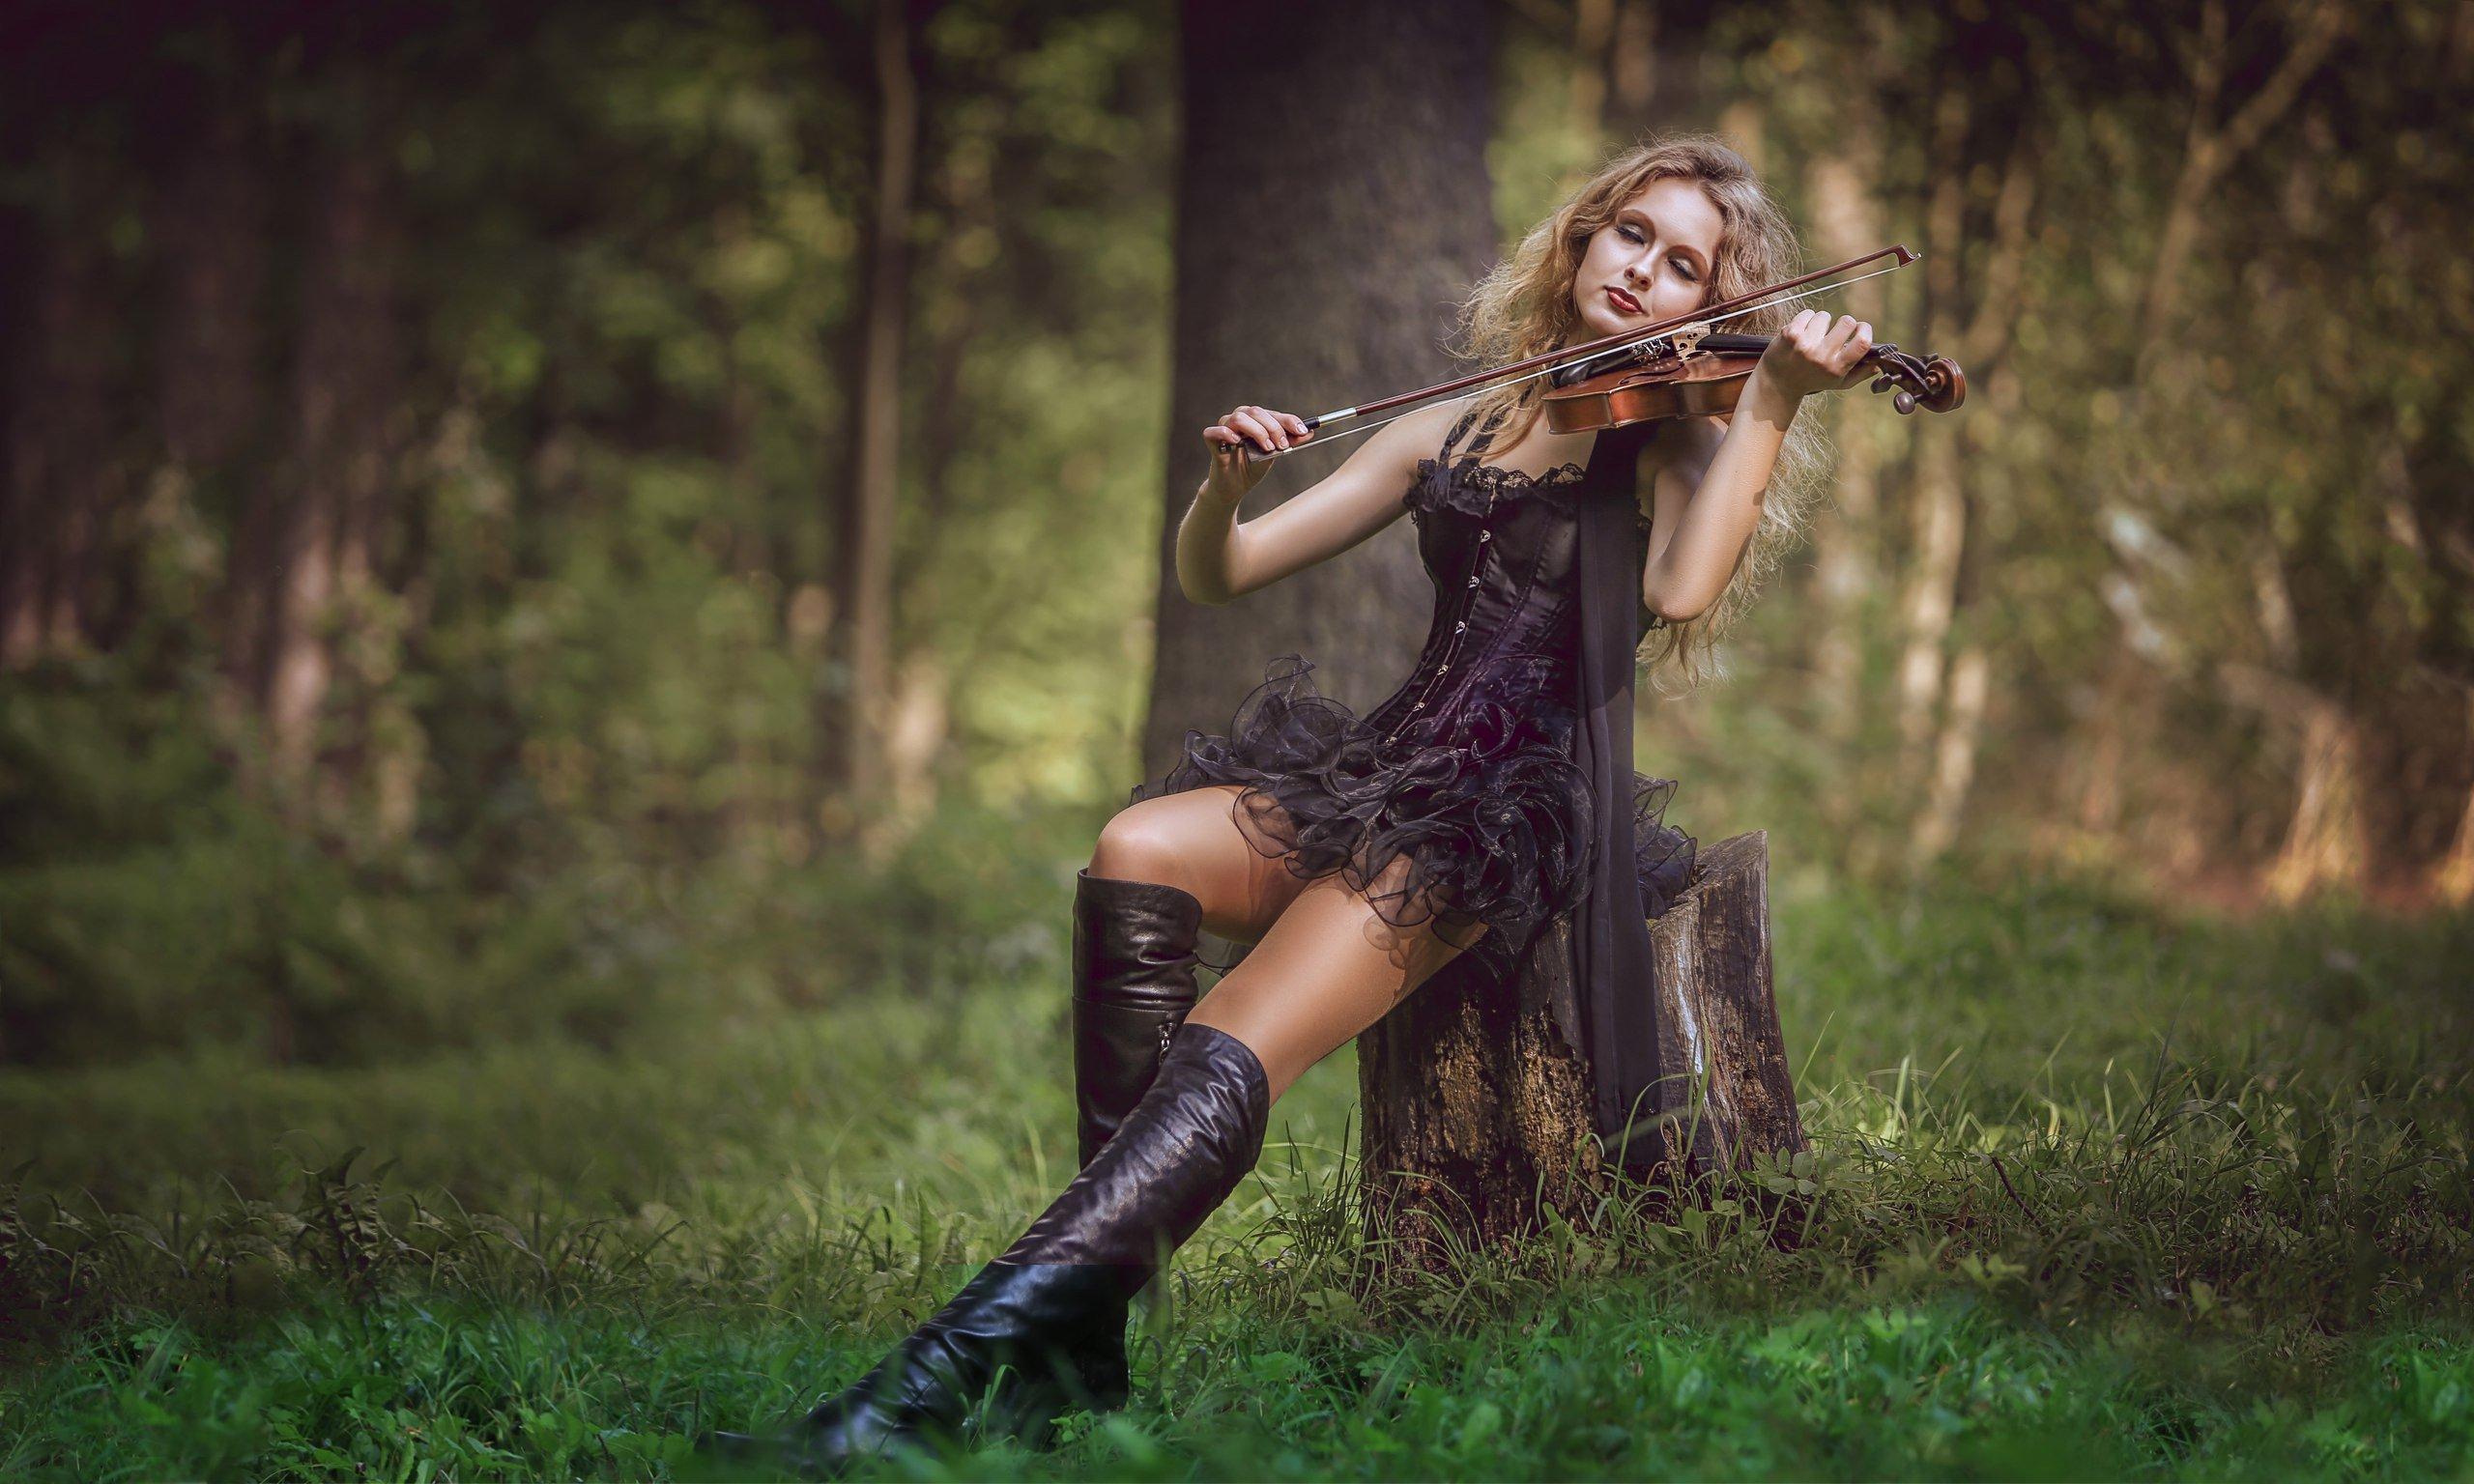 скрипка, скрипачка, девушка, лес, парк, музыка, rekhov, sergejrekhov, Сергей Рехов